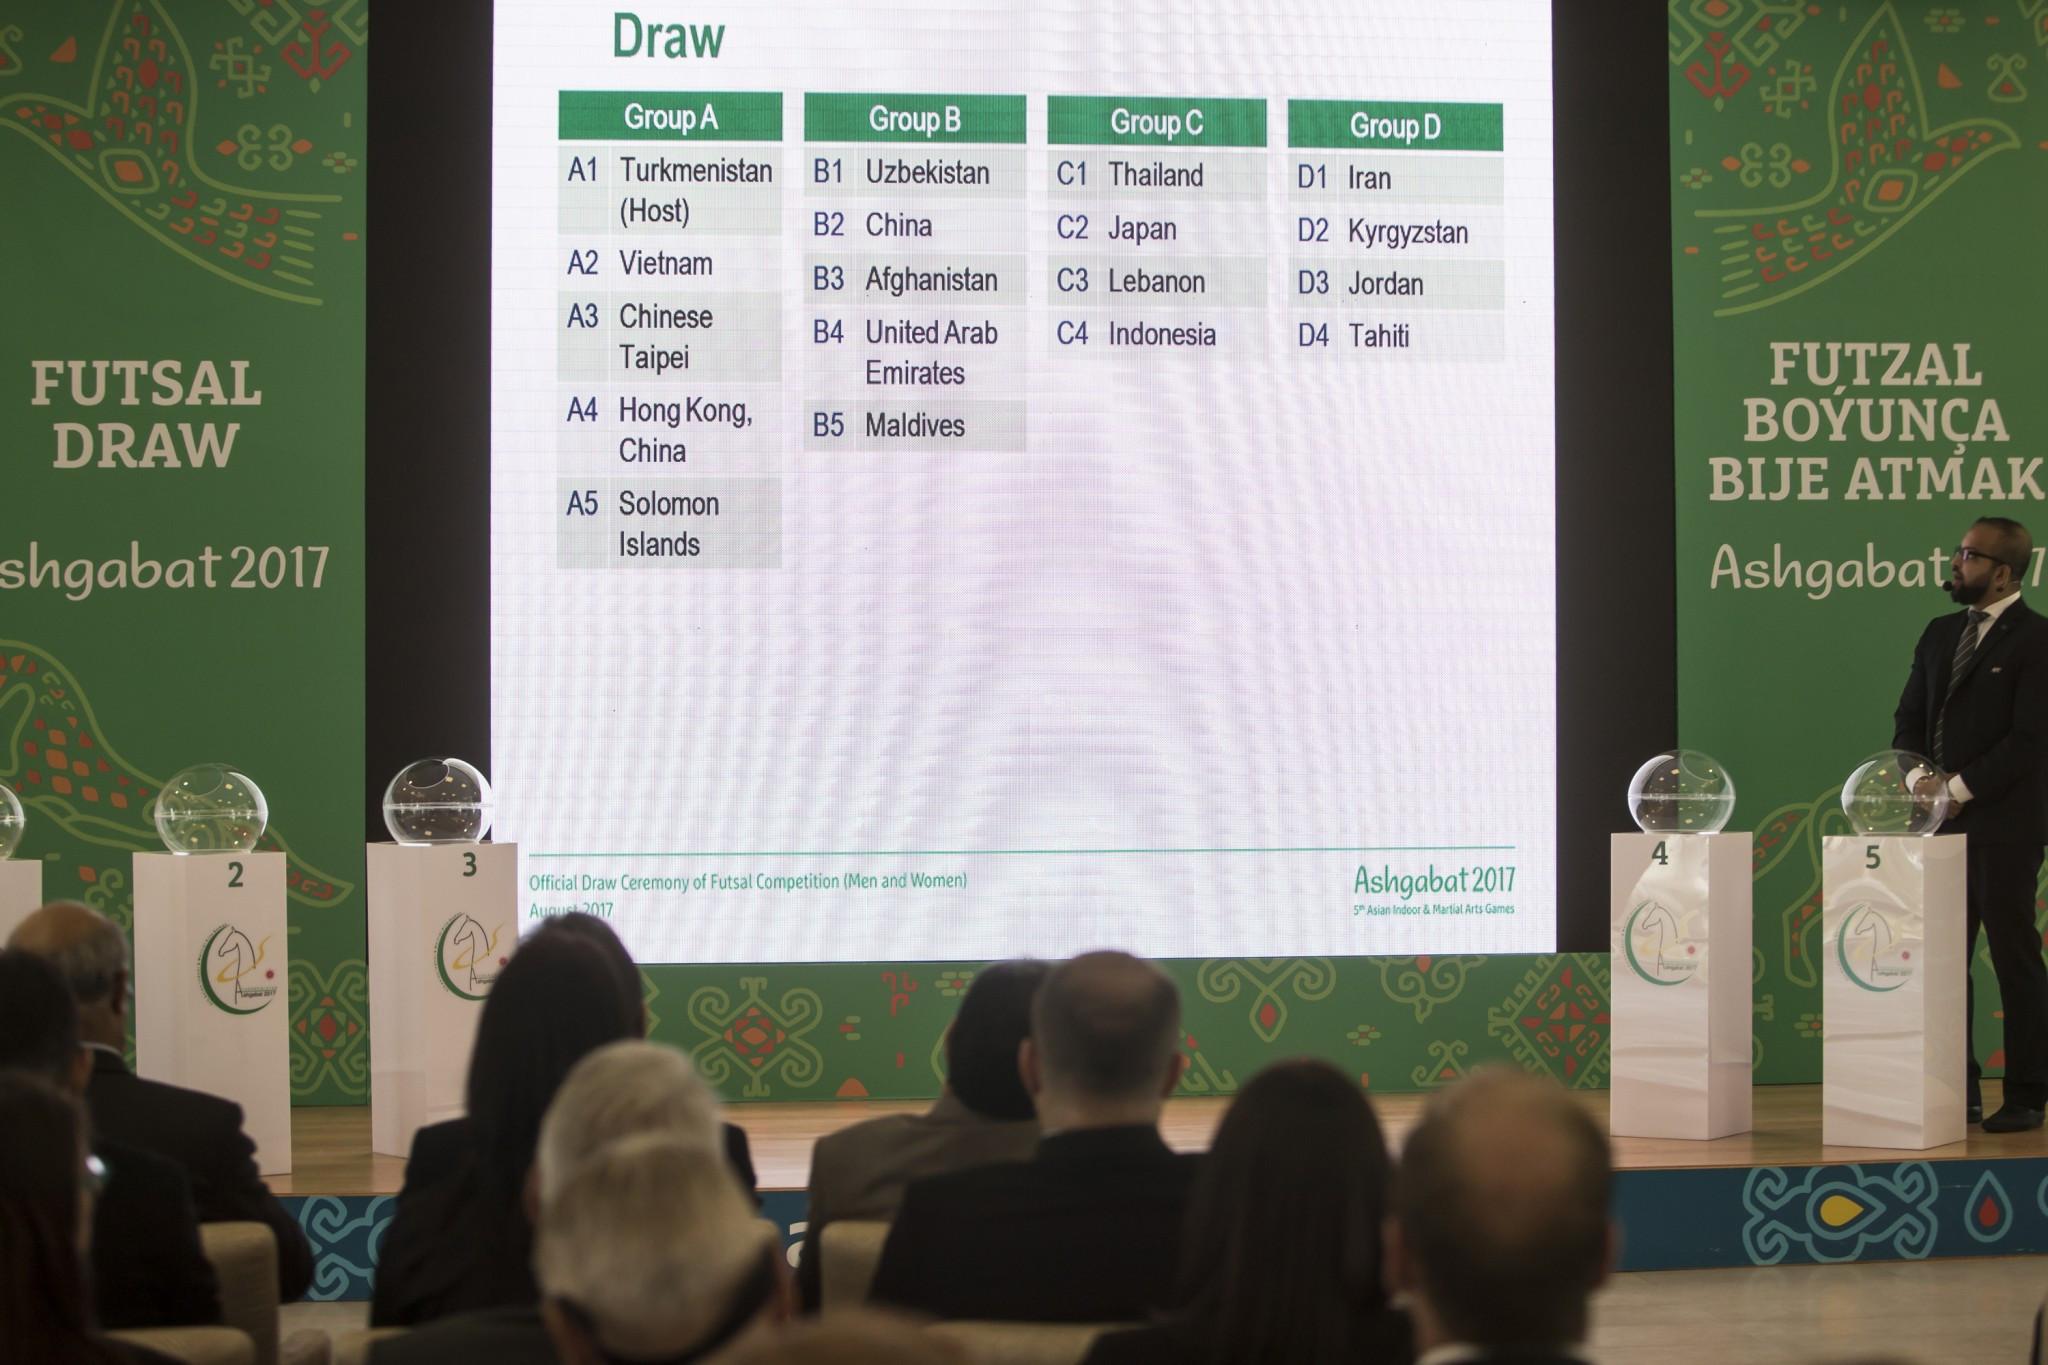 Asian champions Iran drawn in Group D for futsal tournament at Ashgabat 2017